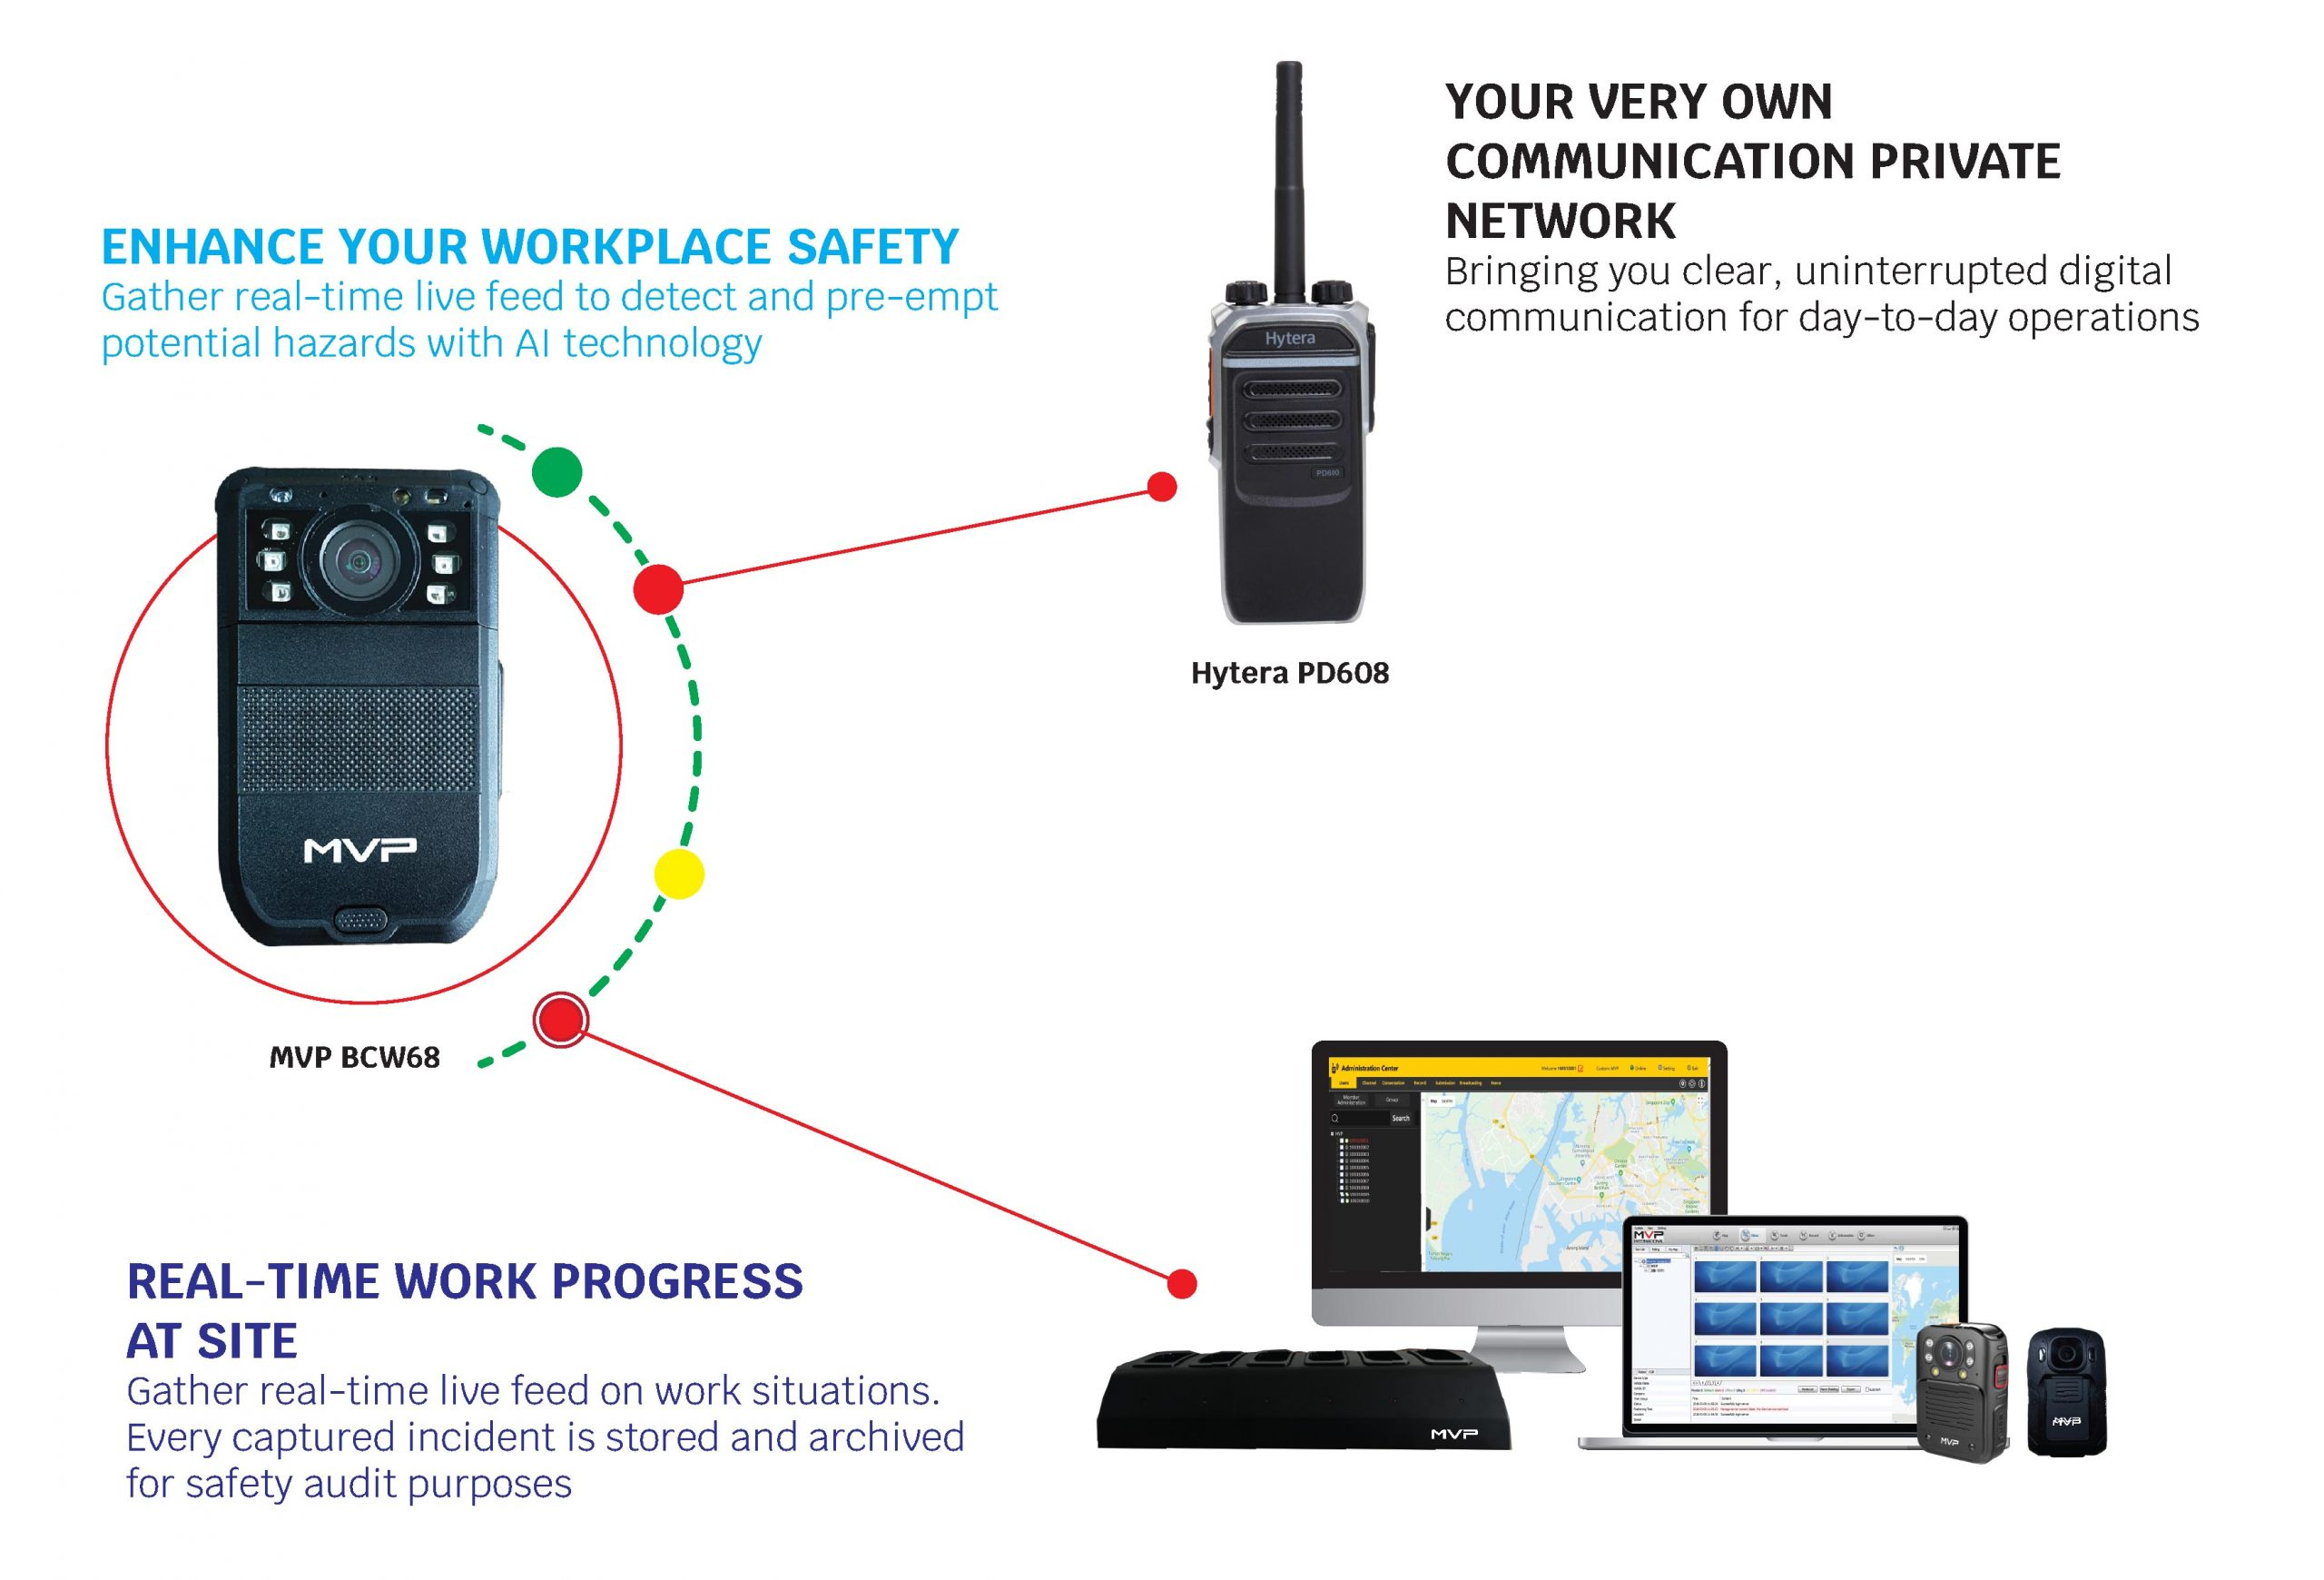 BCW68 Body Camera supports AI